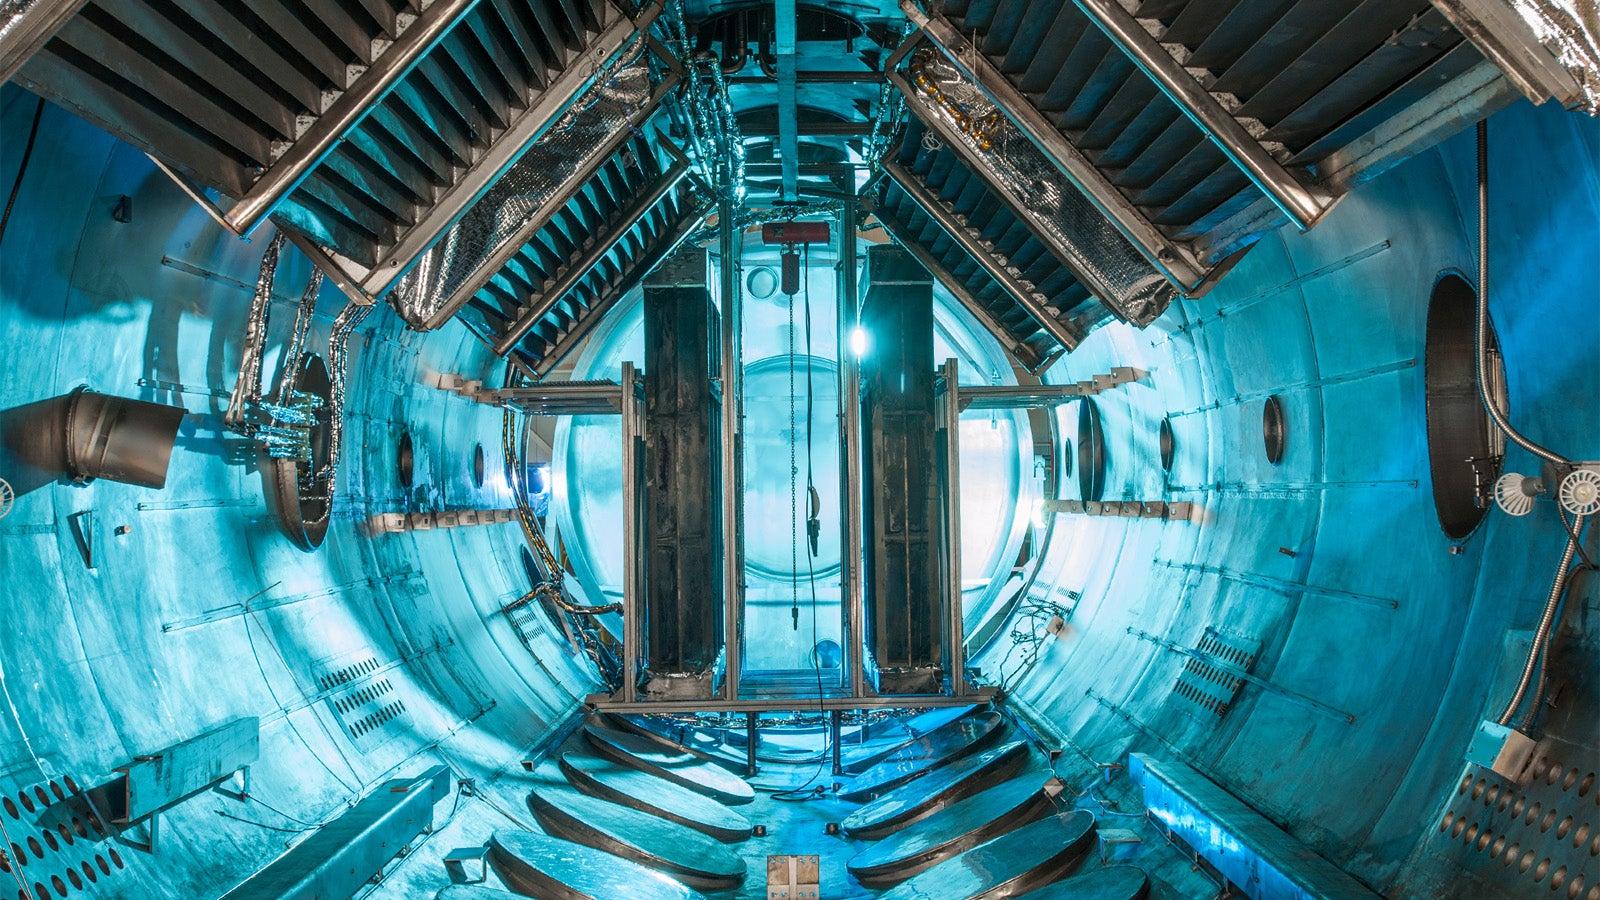 This Vacuum Chamber Looks Like Some Futuristic Spaceship ...